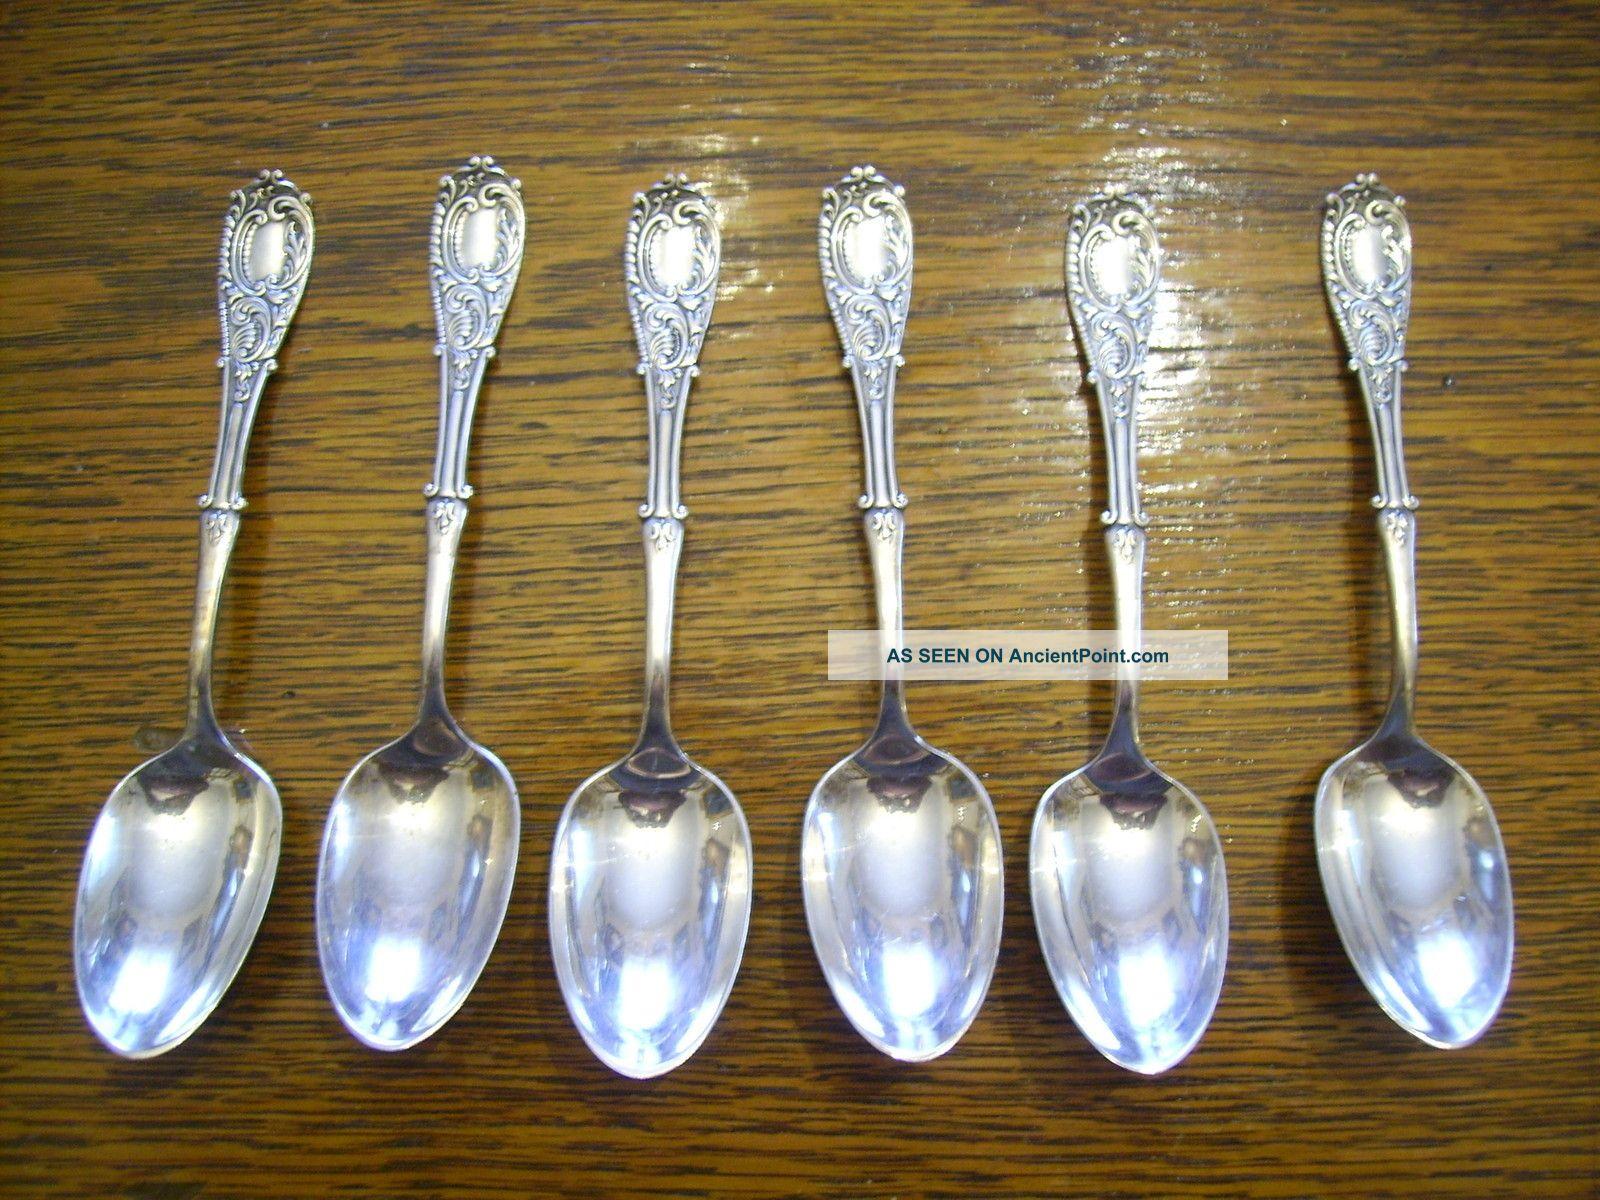 6 Rogers 1893 Moline Teaspoons Is Silverplate Victorian Era International/1847 Rogers photo